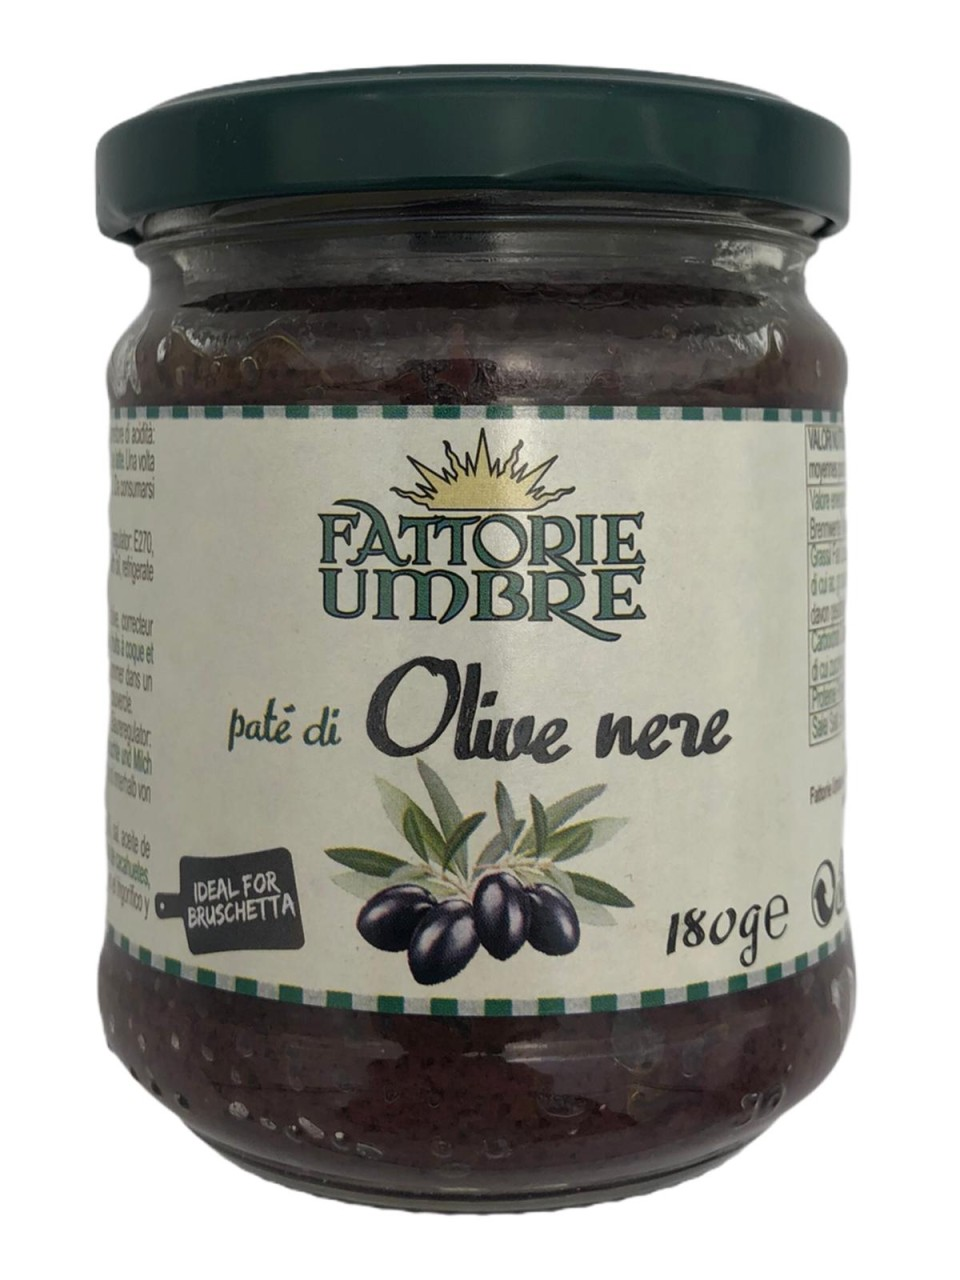 Fattorie Umbre pate di Olive nere 180g